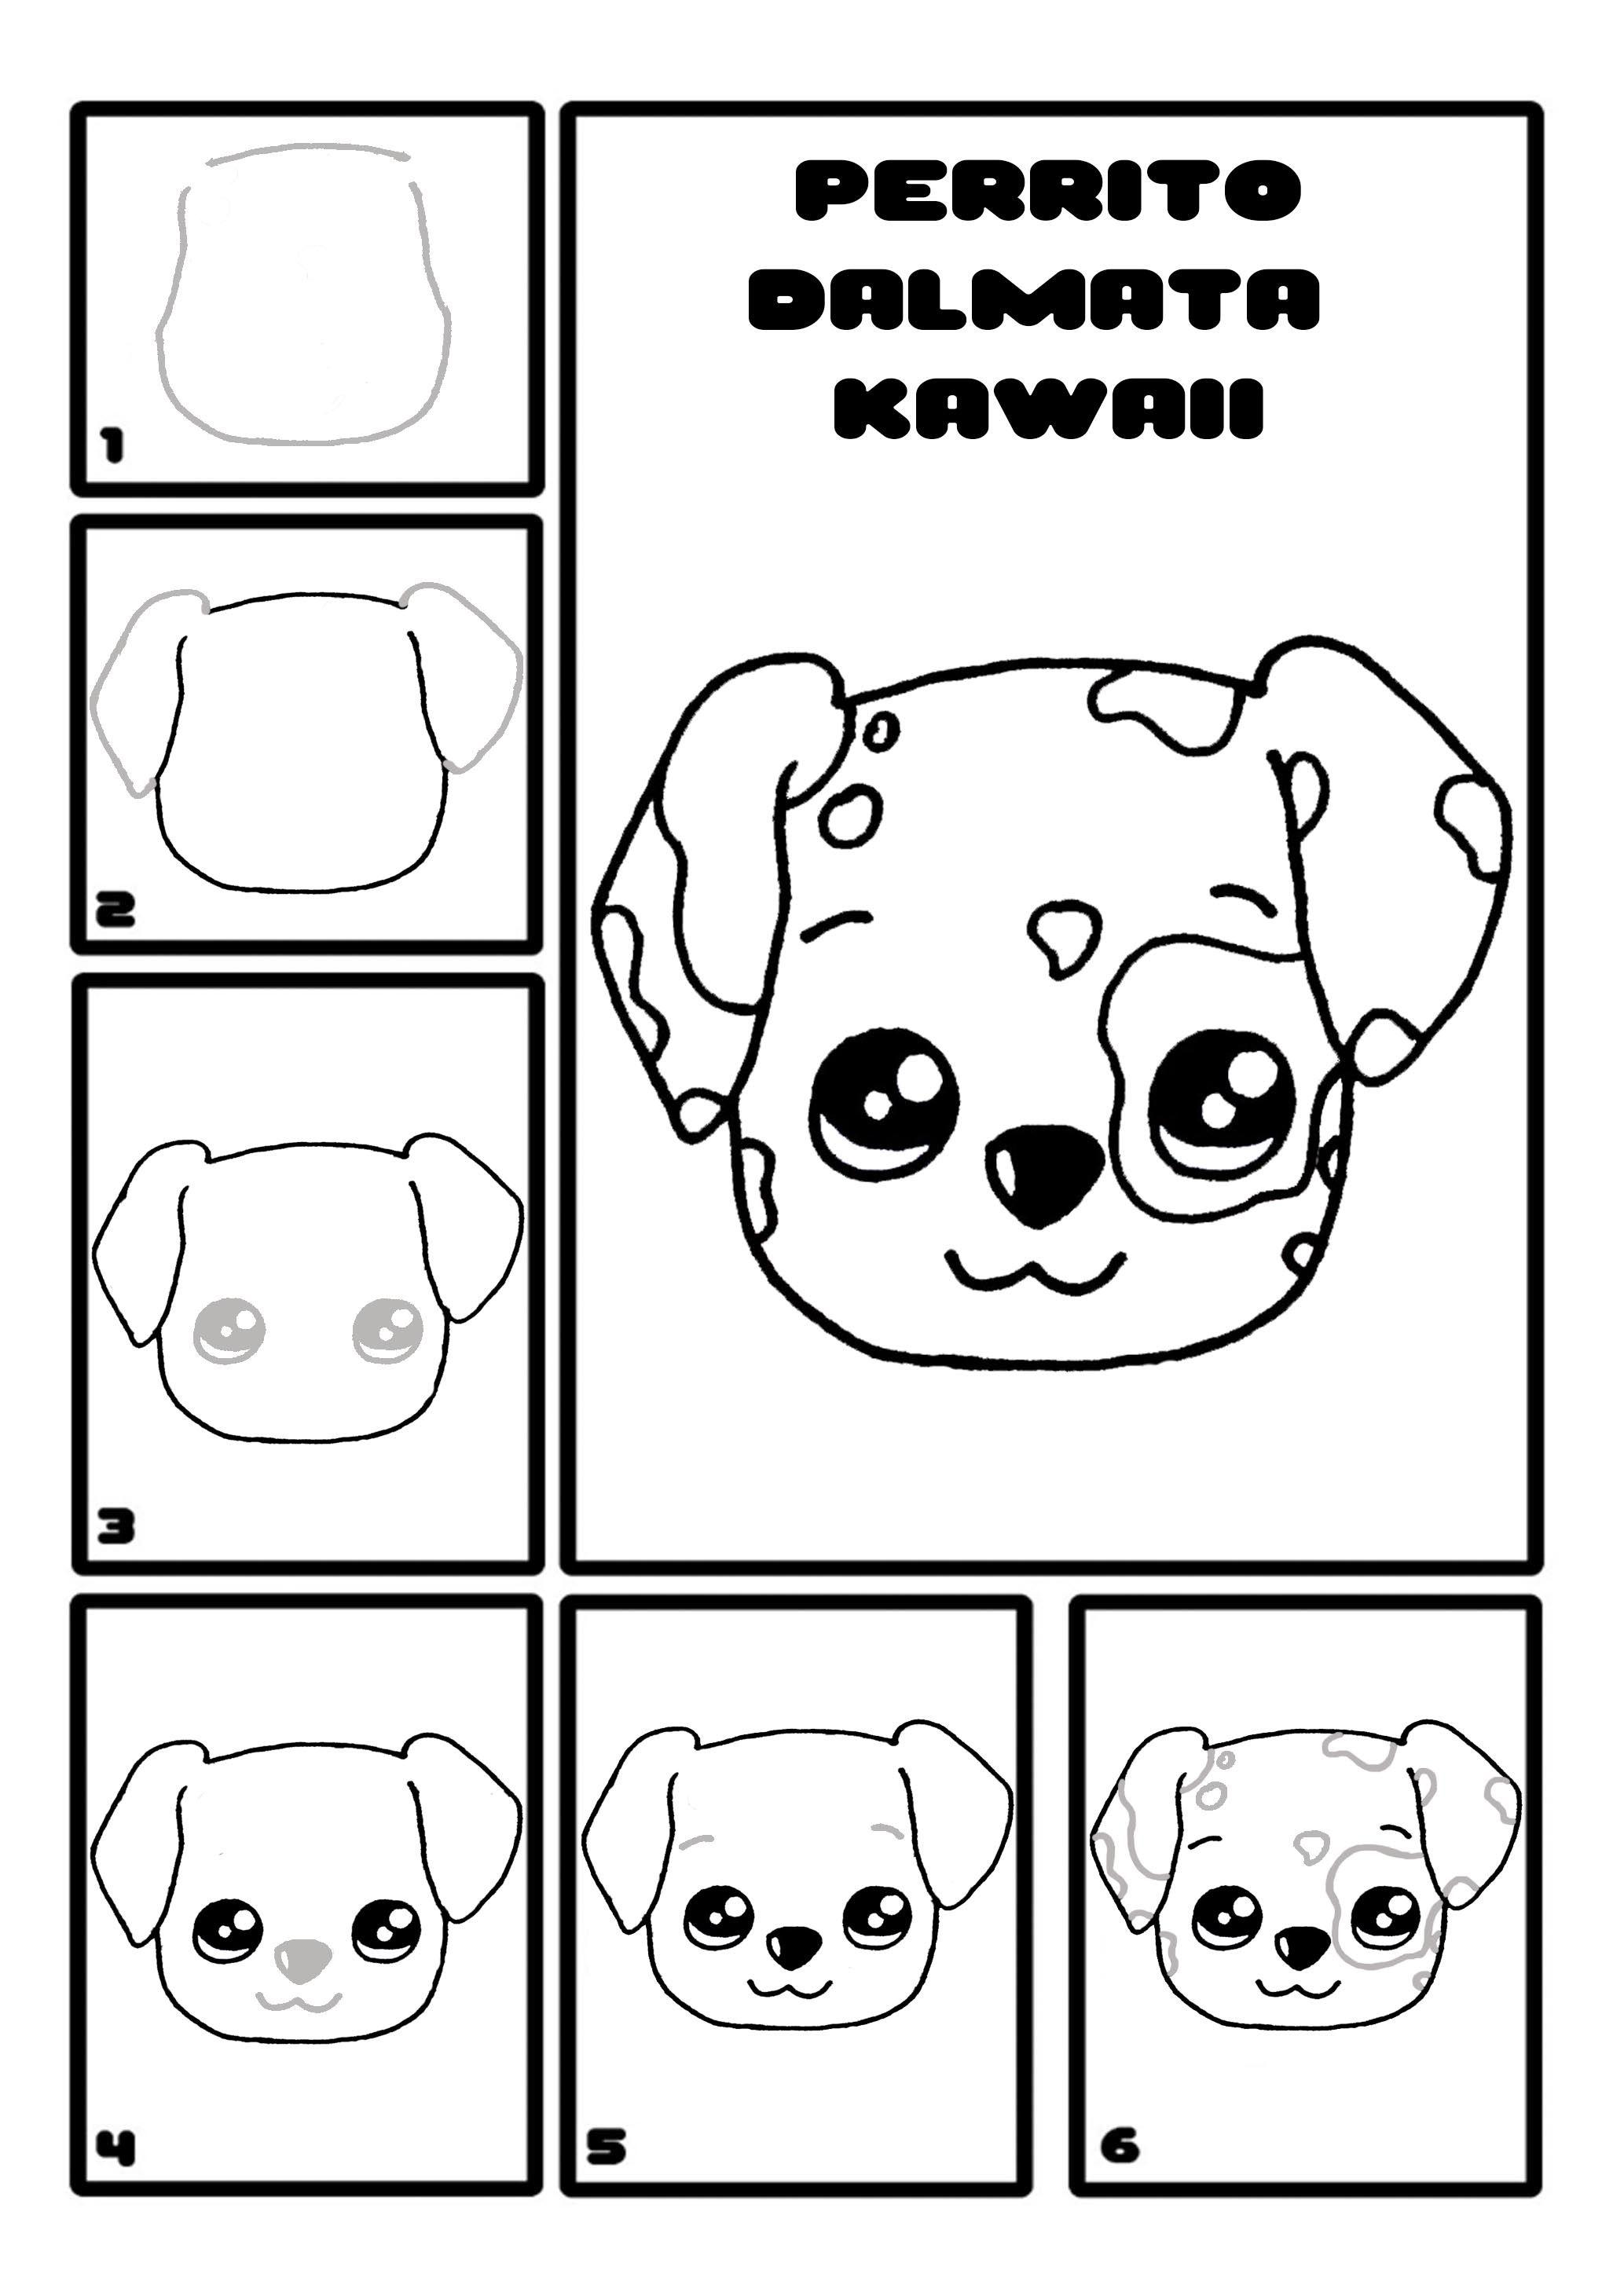 Como Dibujar Un Perro Dalmata Kawaii Paso A Paso Como Dibujar Un Perro Como Dibujar Kawaii Como Dibujar